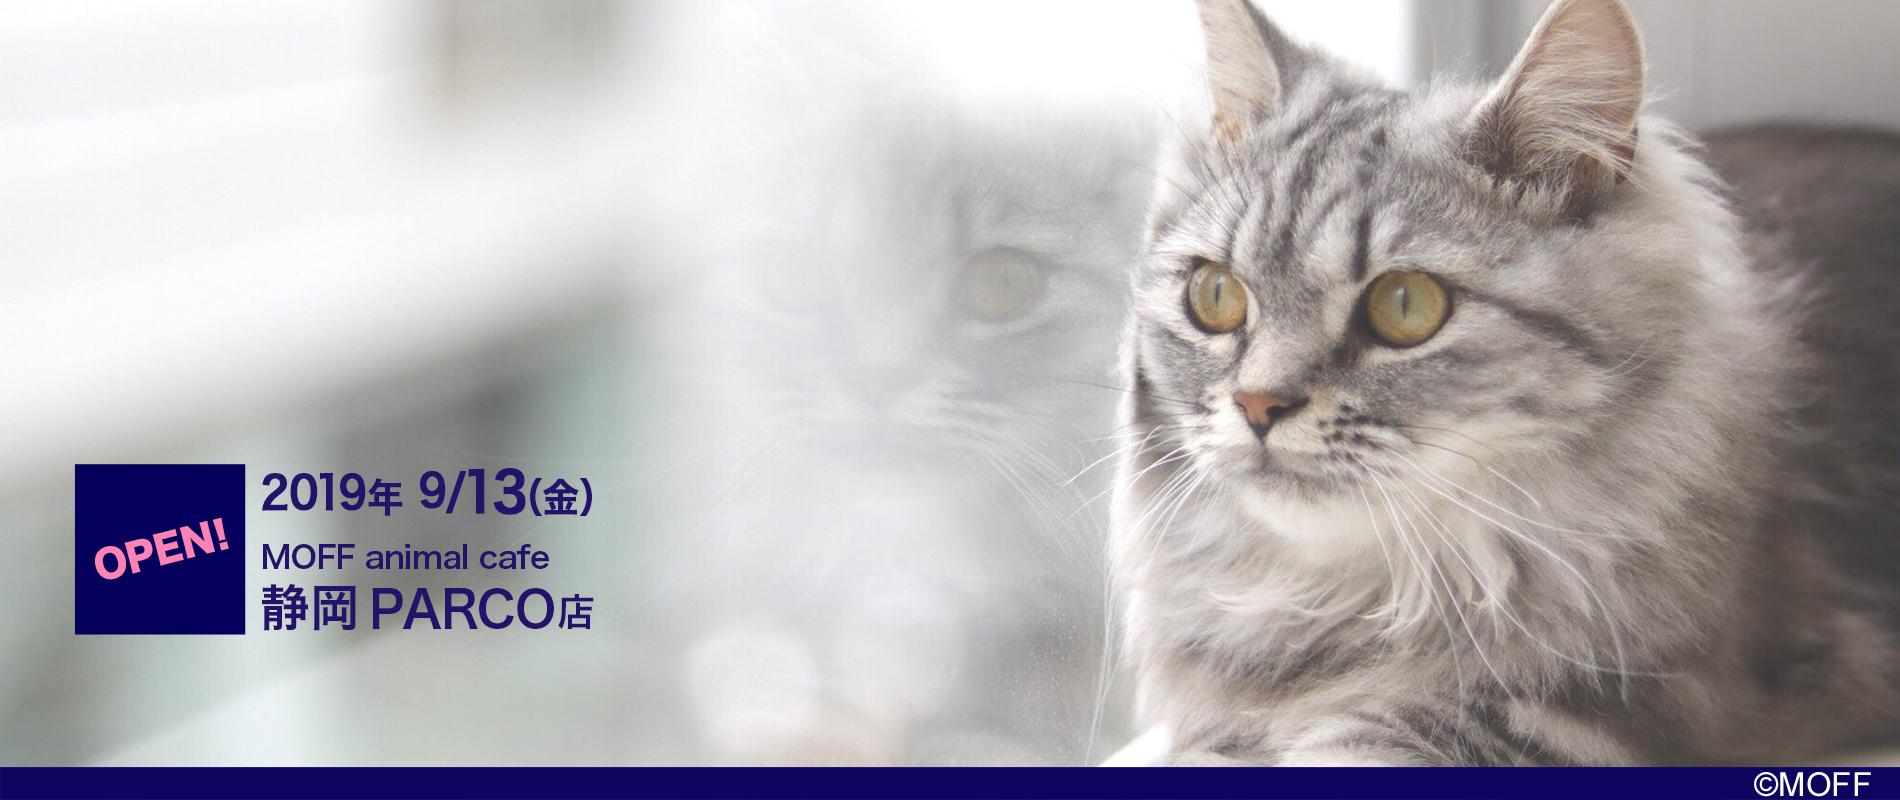 Moff animal cafe 静岡PARCO店 2019年9月13日オープン!